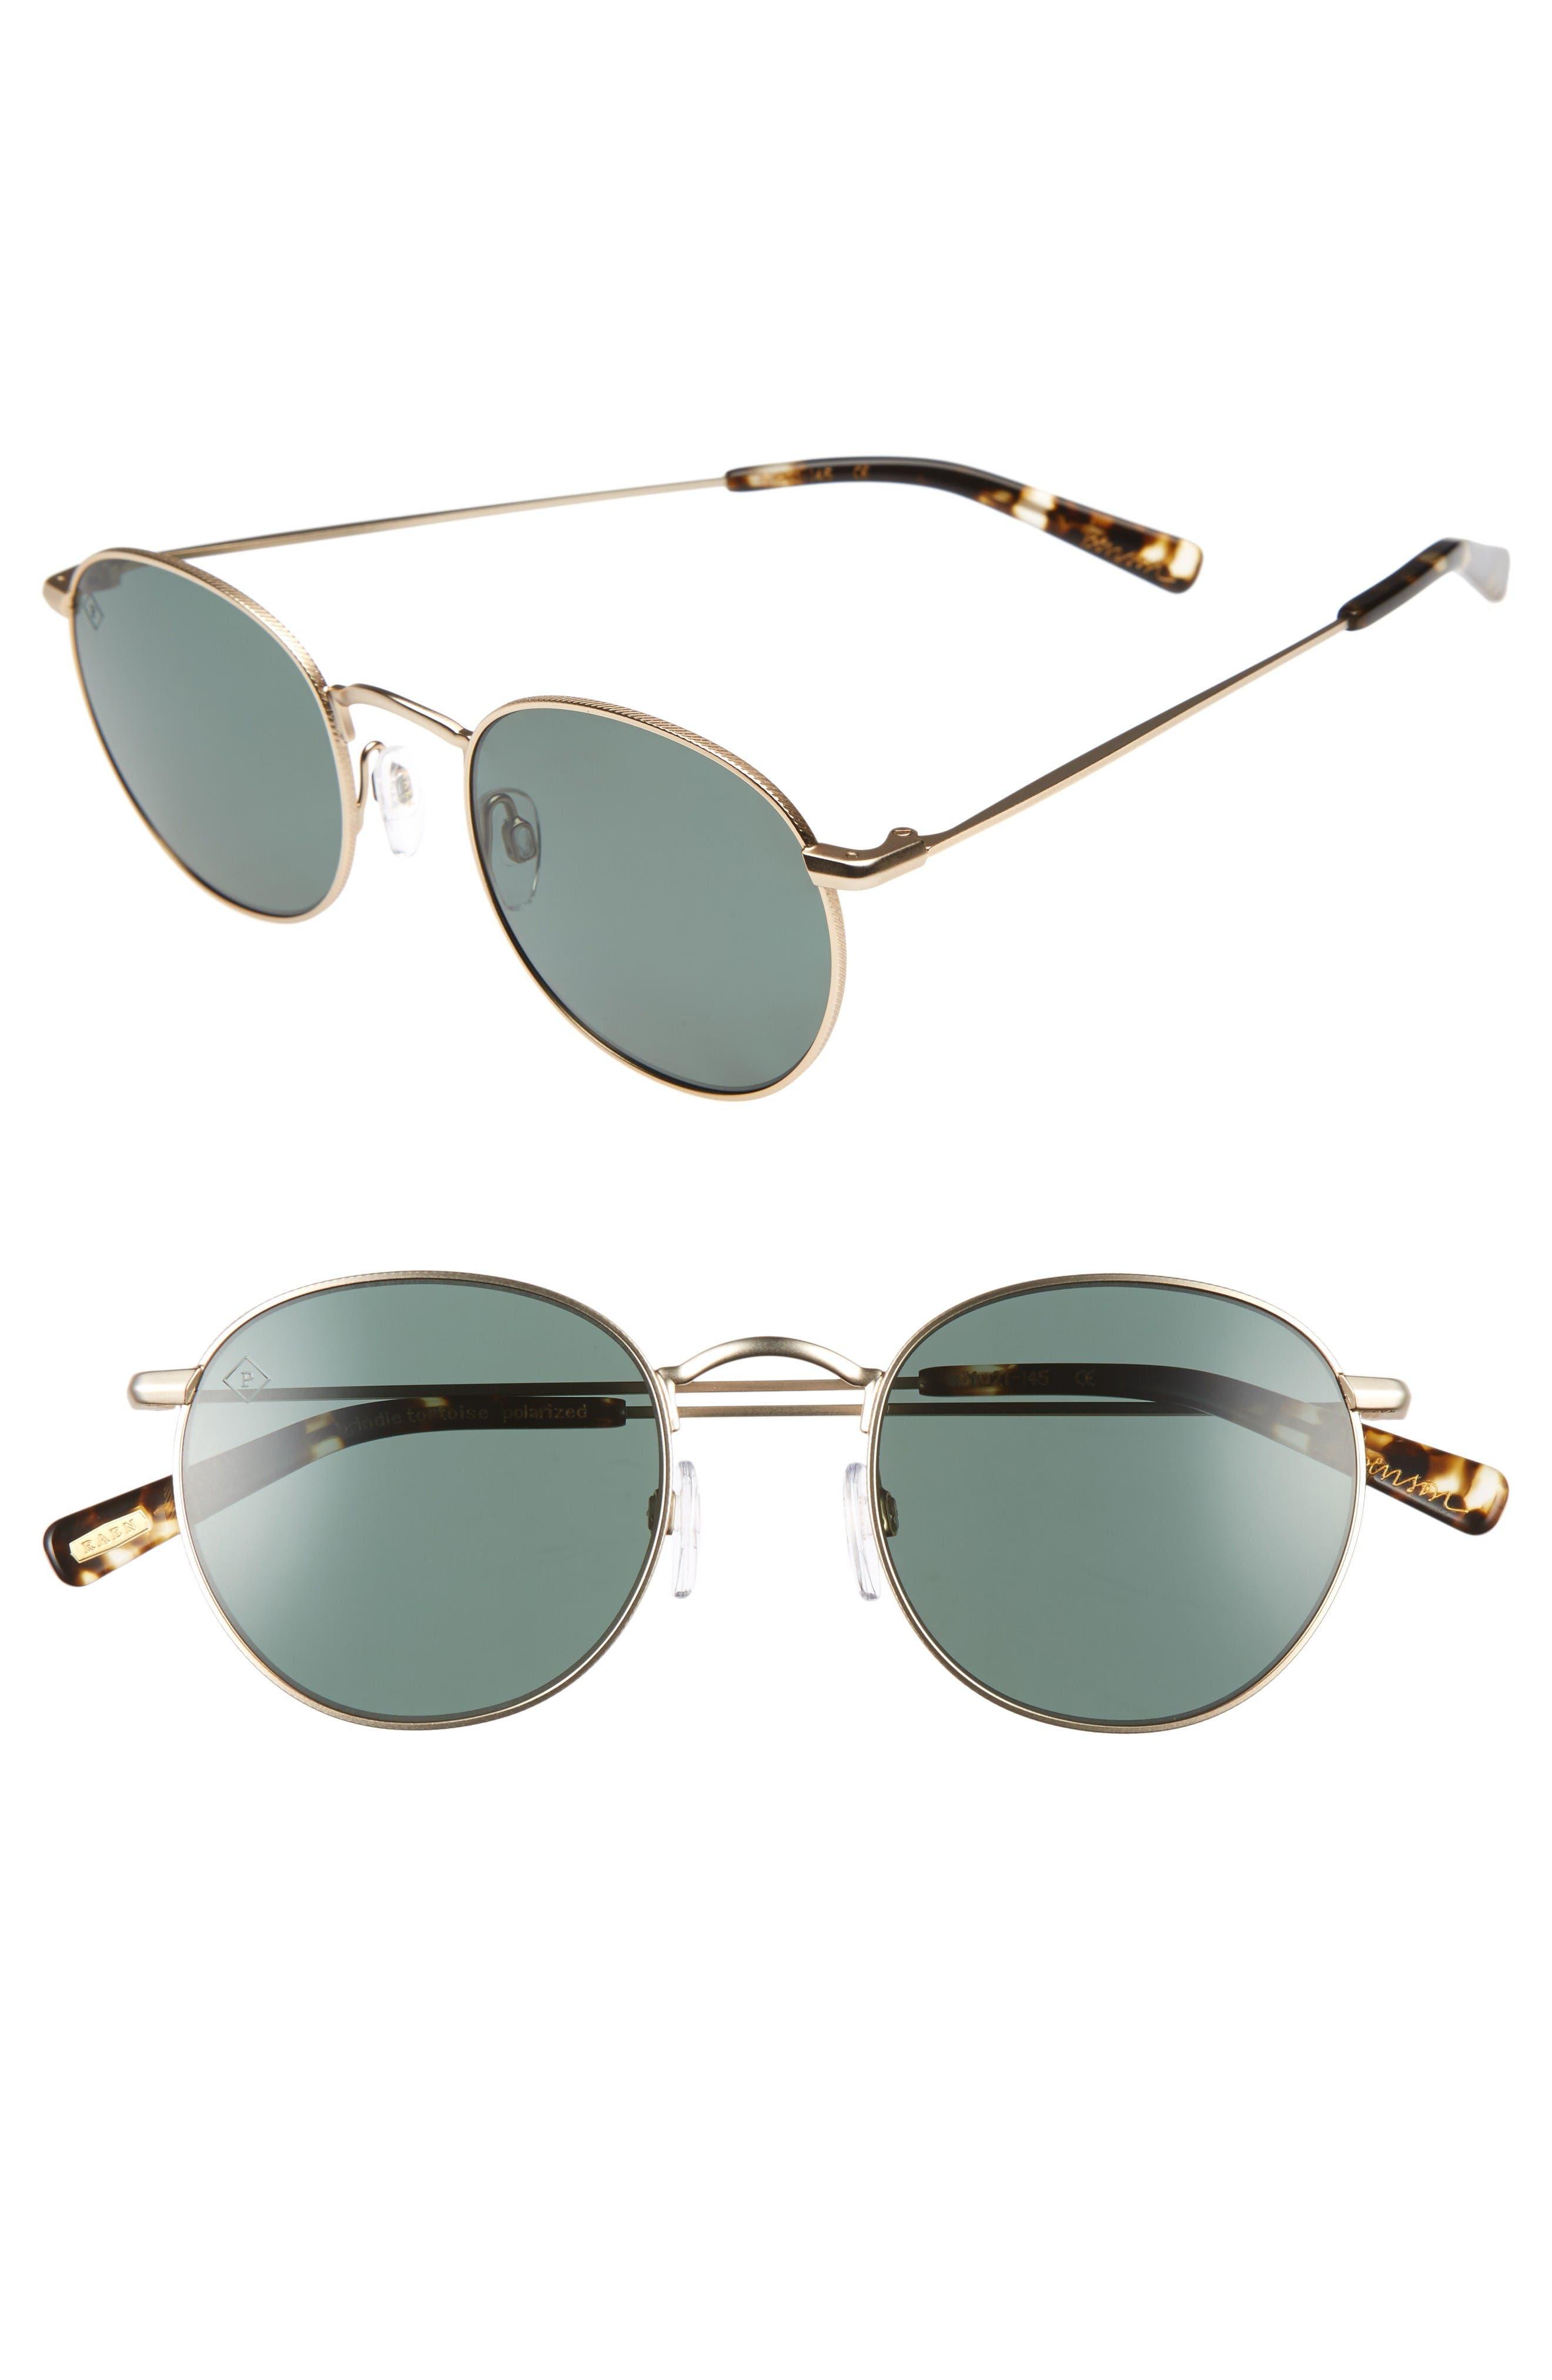 Benson 51mm Polarized Sunglasses,                         Main,                         color, Gold/ Brindle